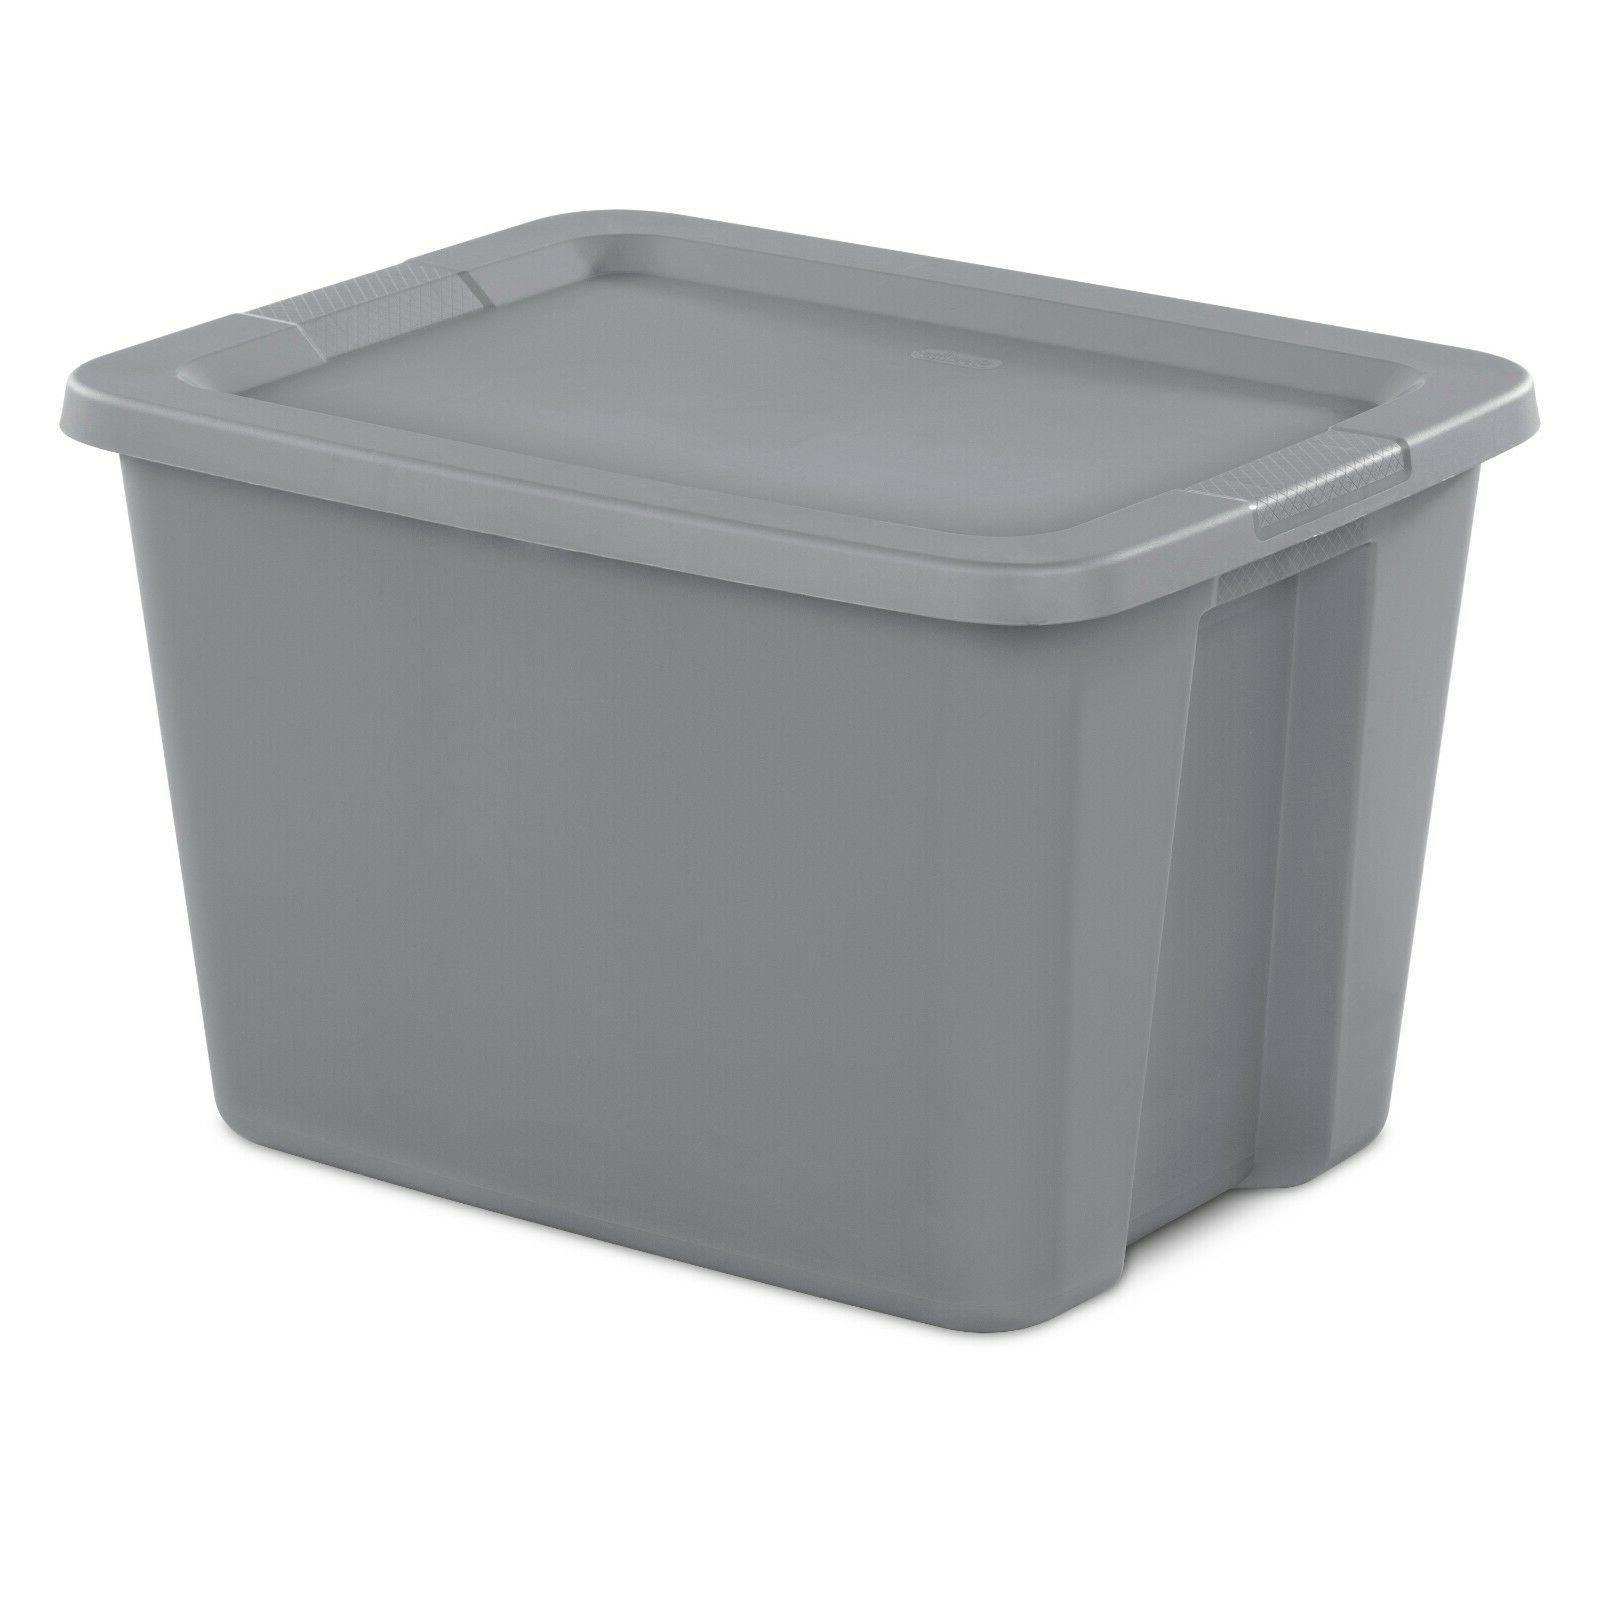 8 pk Plastic Container Box Set Bin 18-Gallon Stackable Plastic Kids